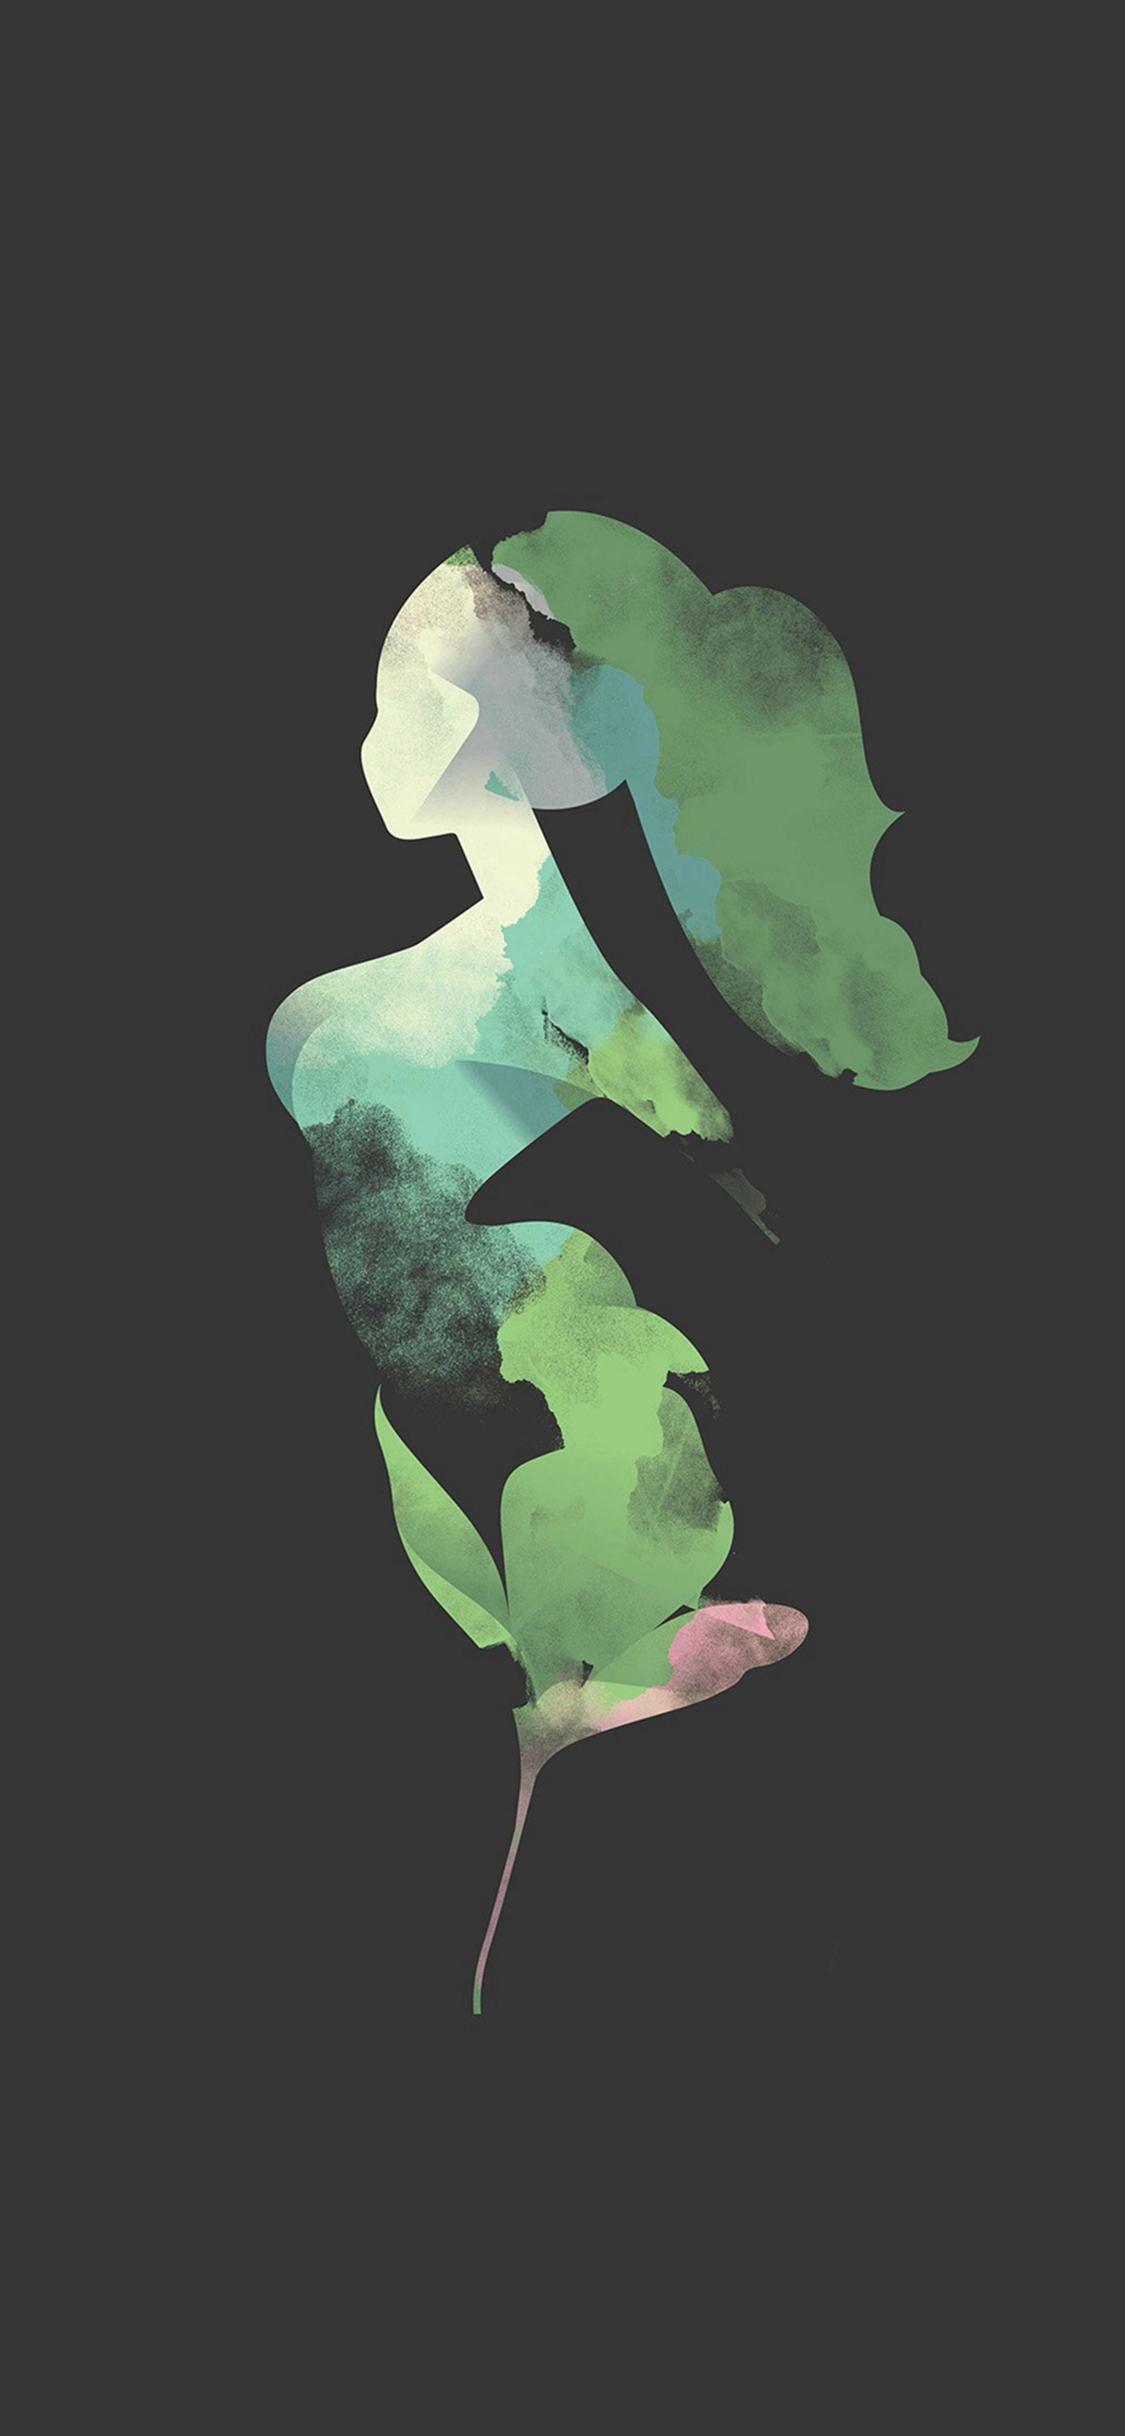 Flower Dark Woman Illustration Art iPhone X Wallpapers Download 1125x2436